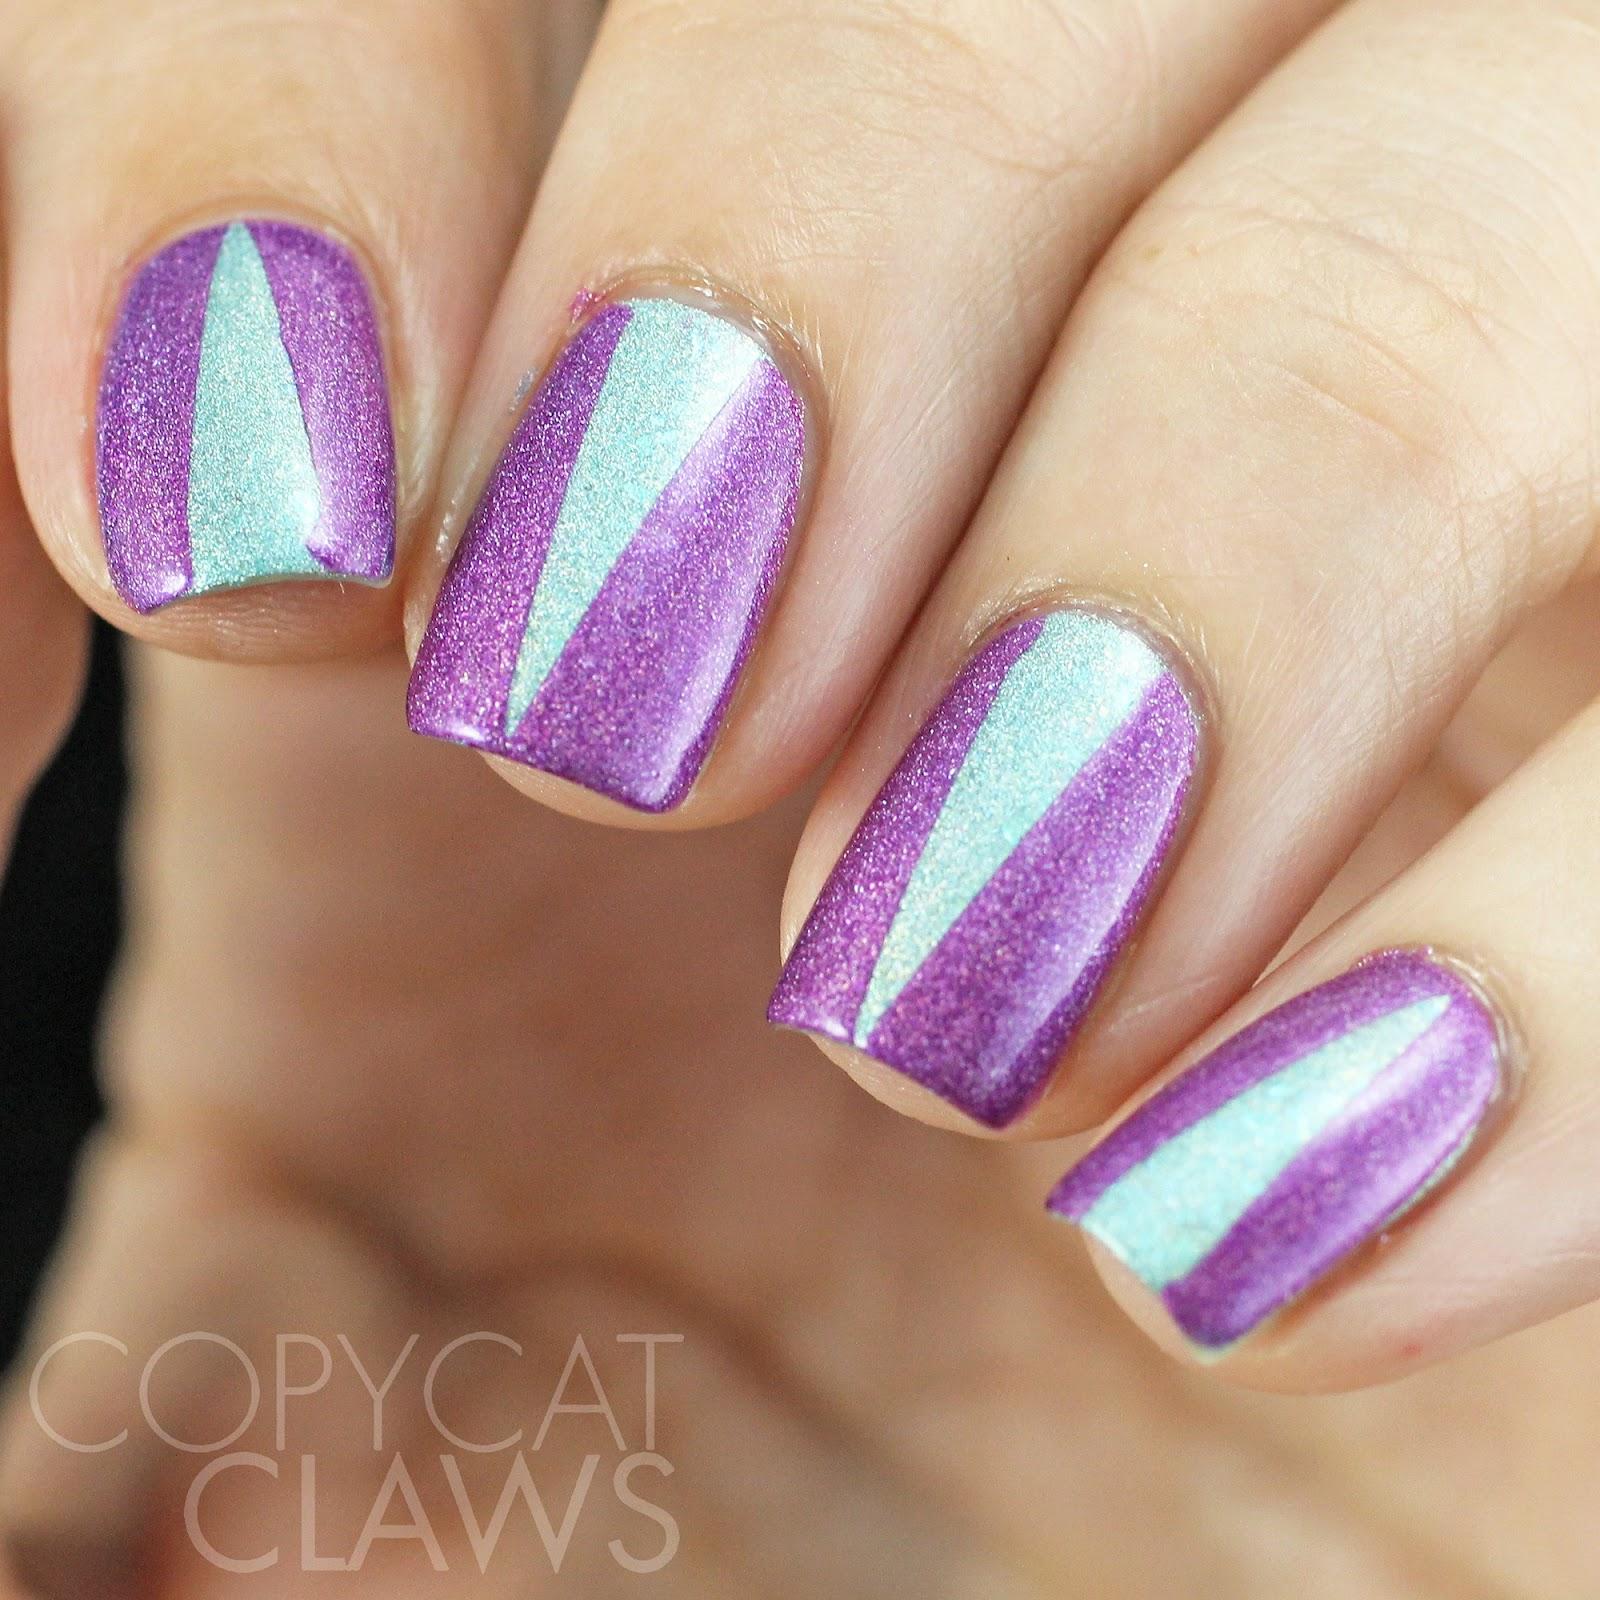 Girly Nail Art: Copycat Claws: Girly Bits Triangle Nail Art